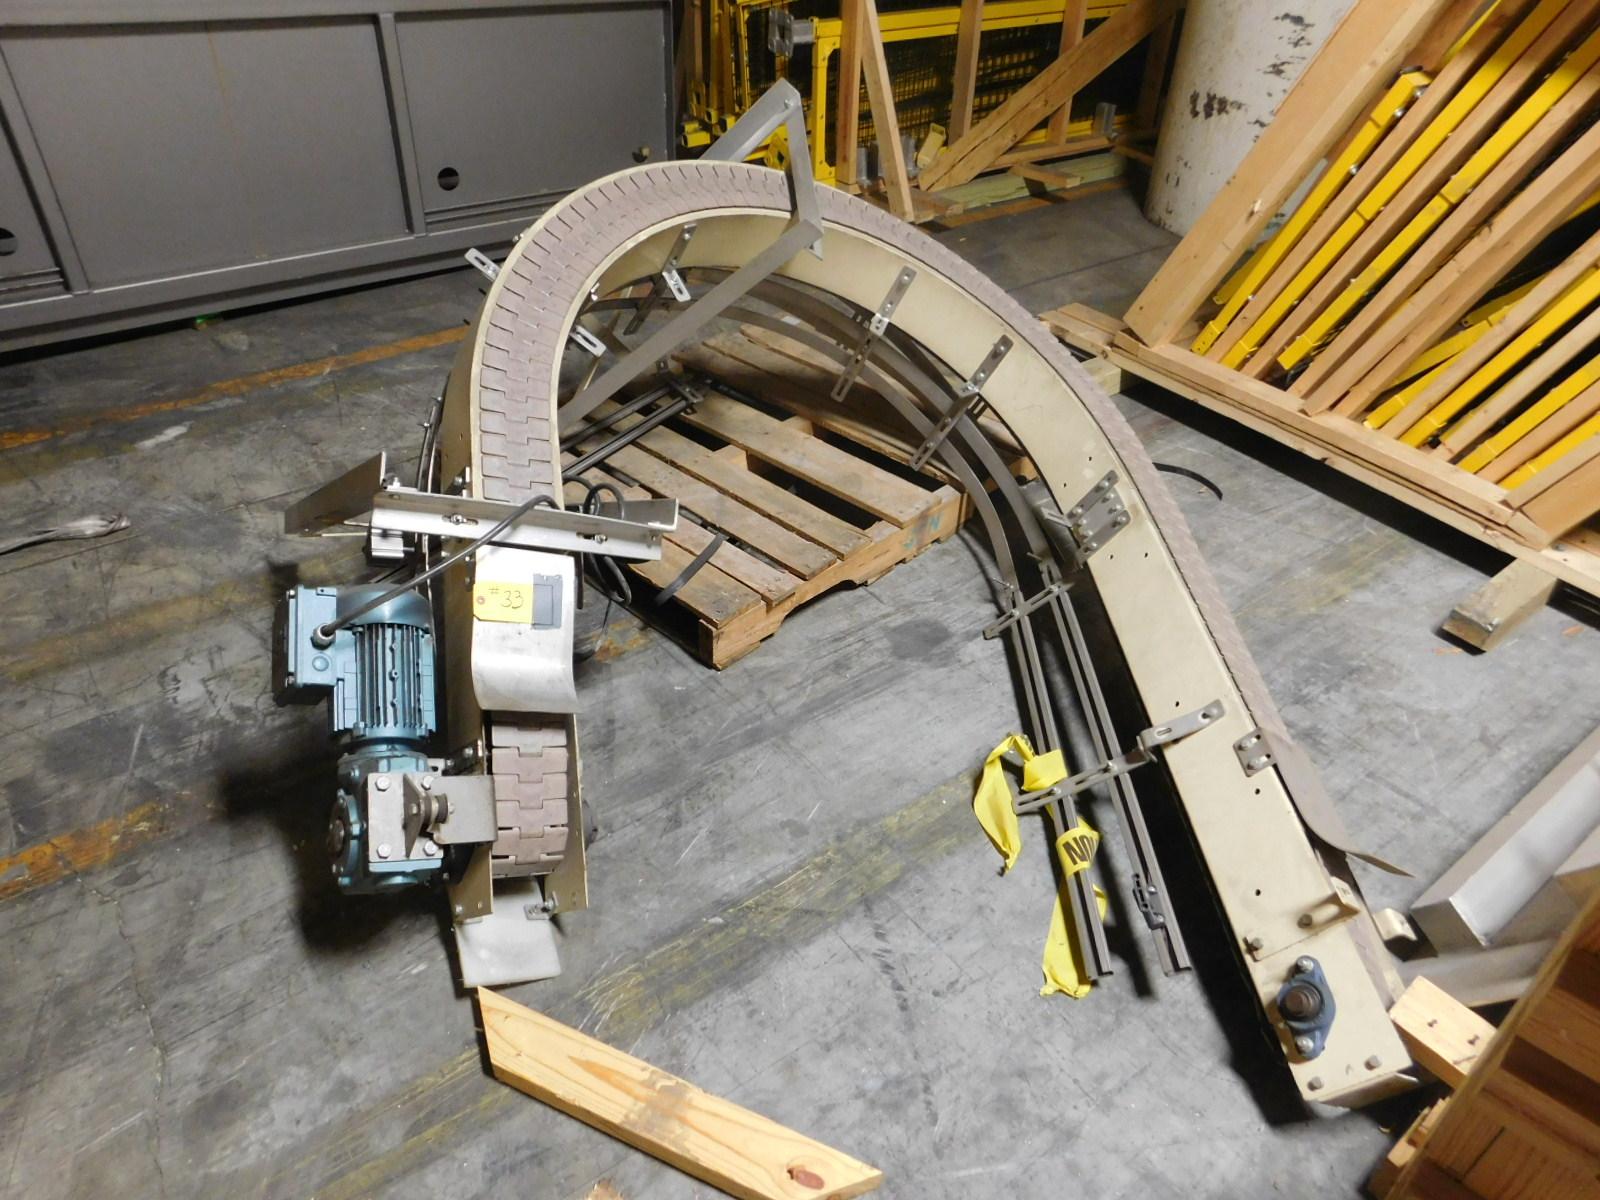 Lot 33 - Flex Turner conveyor Motorized conveyor,4'x 180 degree turn conveyor :equipment located at Clark